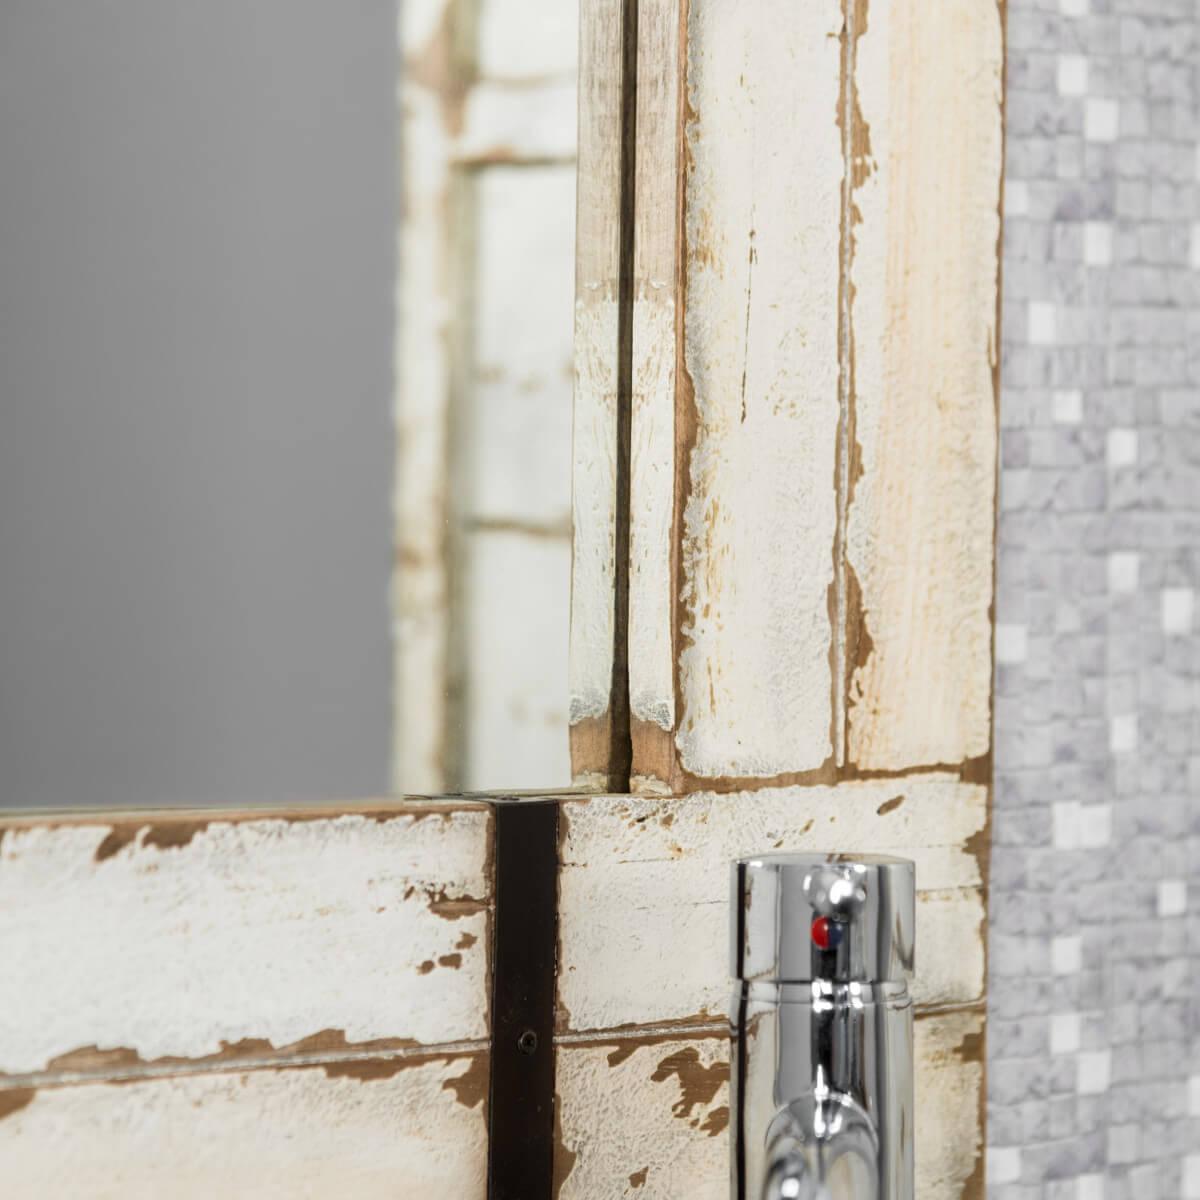 miroir de salle de bain en mindi 60x80 loft blanc. Black Bedroom Furniture Sets. Home Design Ideas